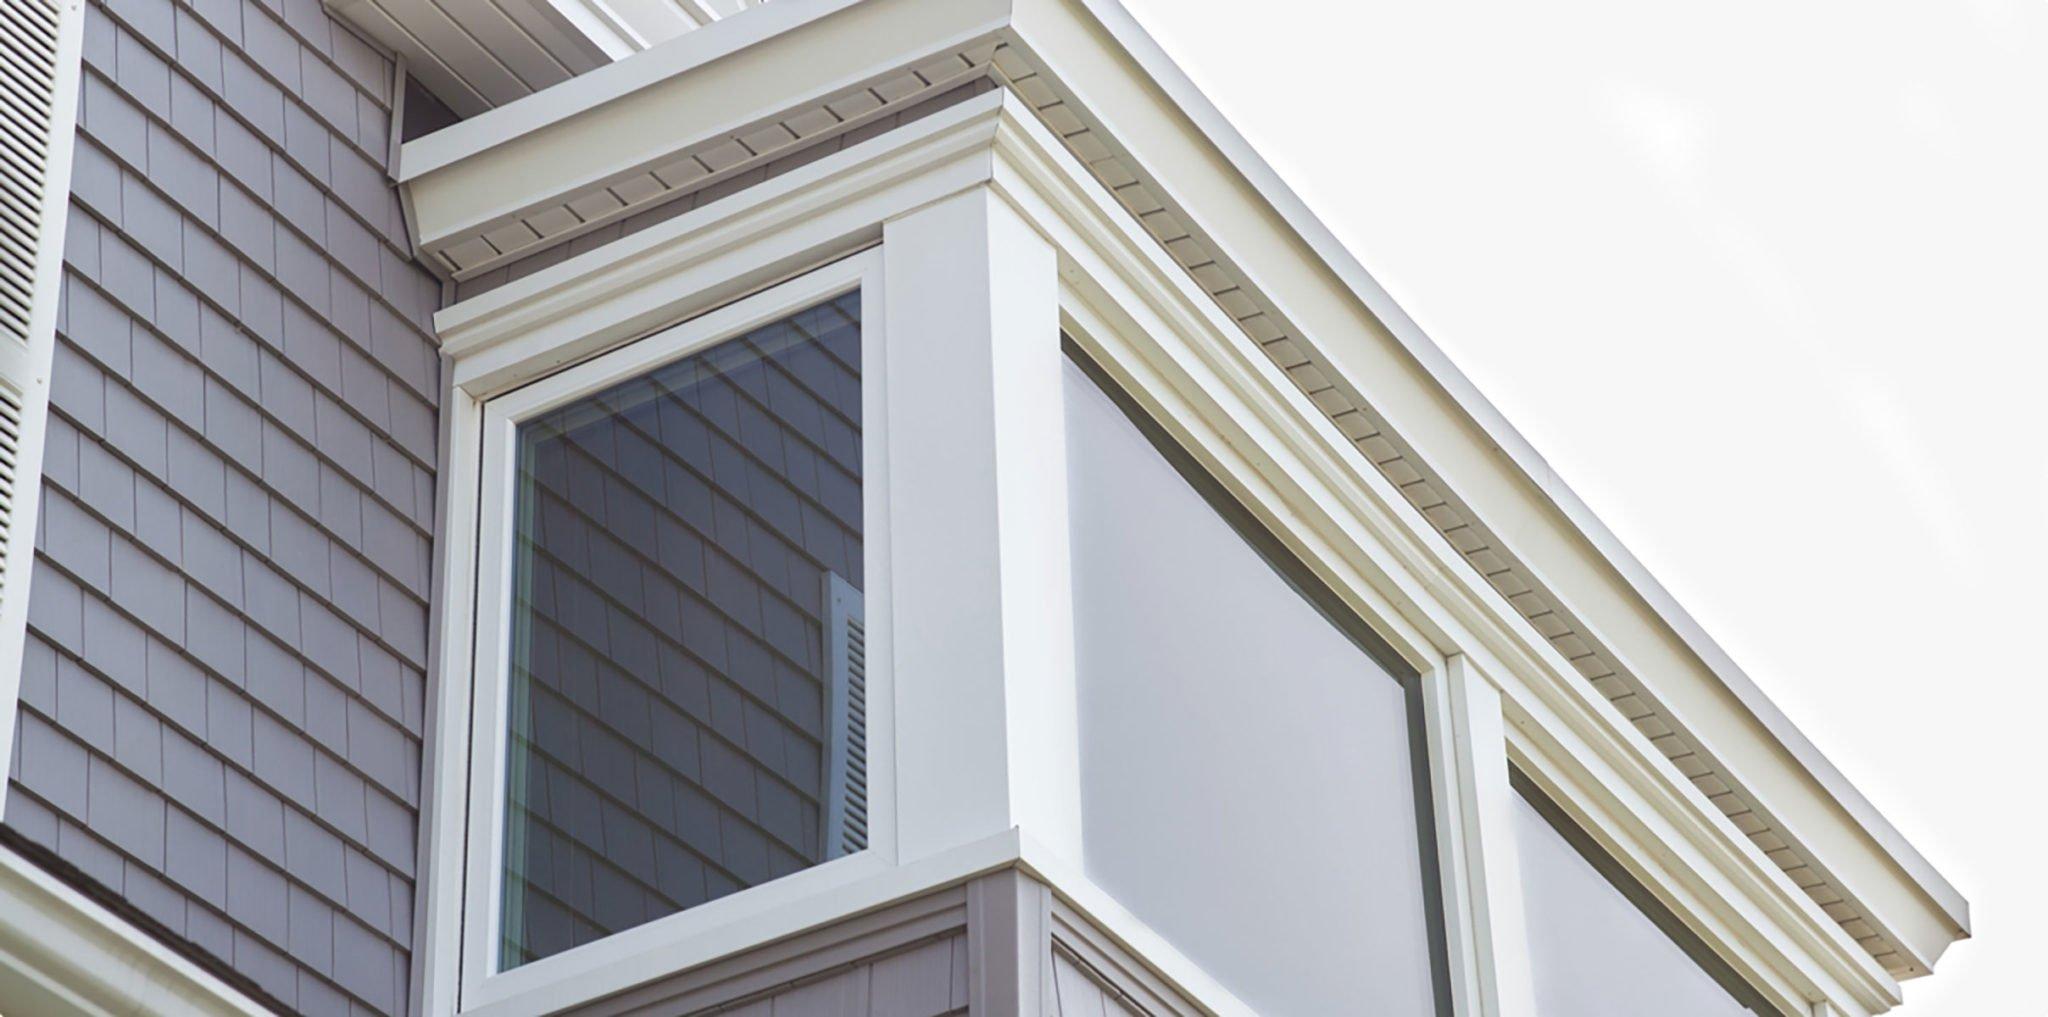 Granite Gray CertainTeed Ceder Impressions Vinyl Siding in Rhode Island